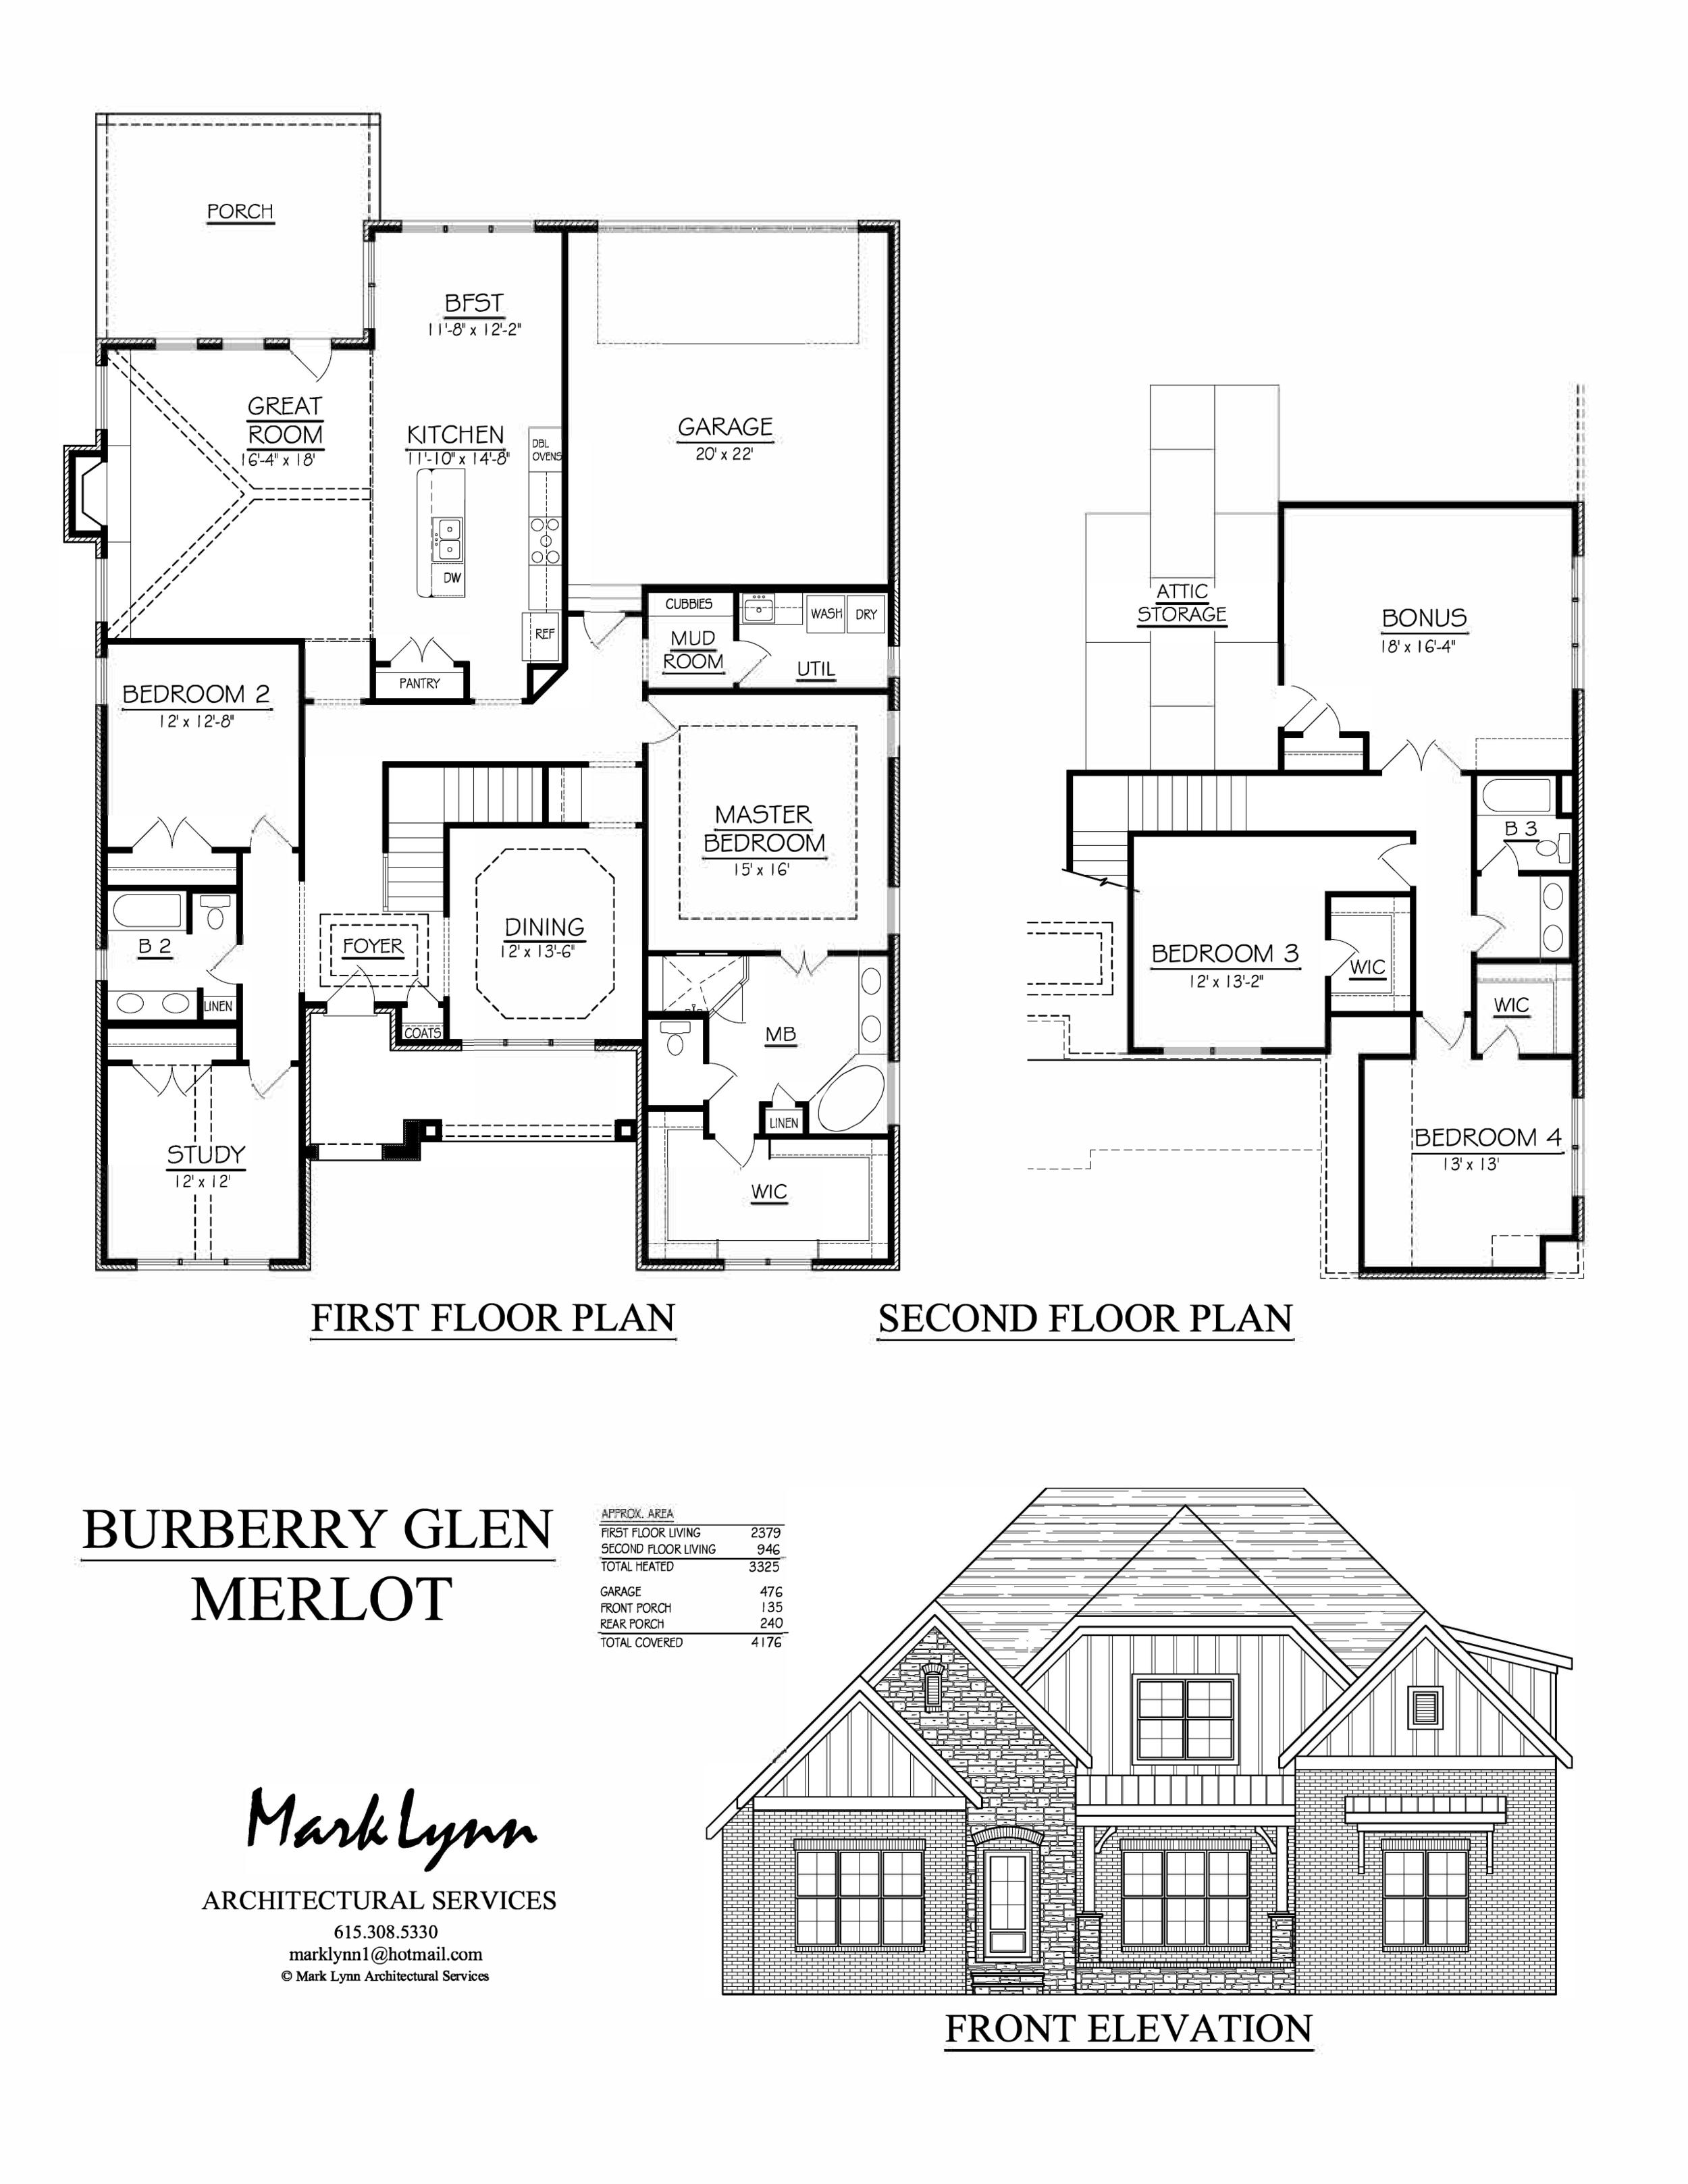 Burberry-Merlot